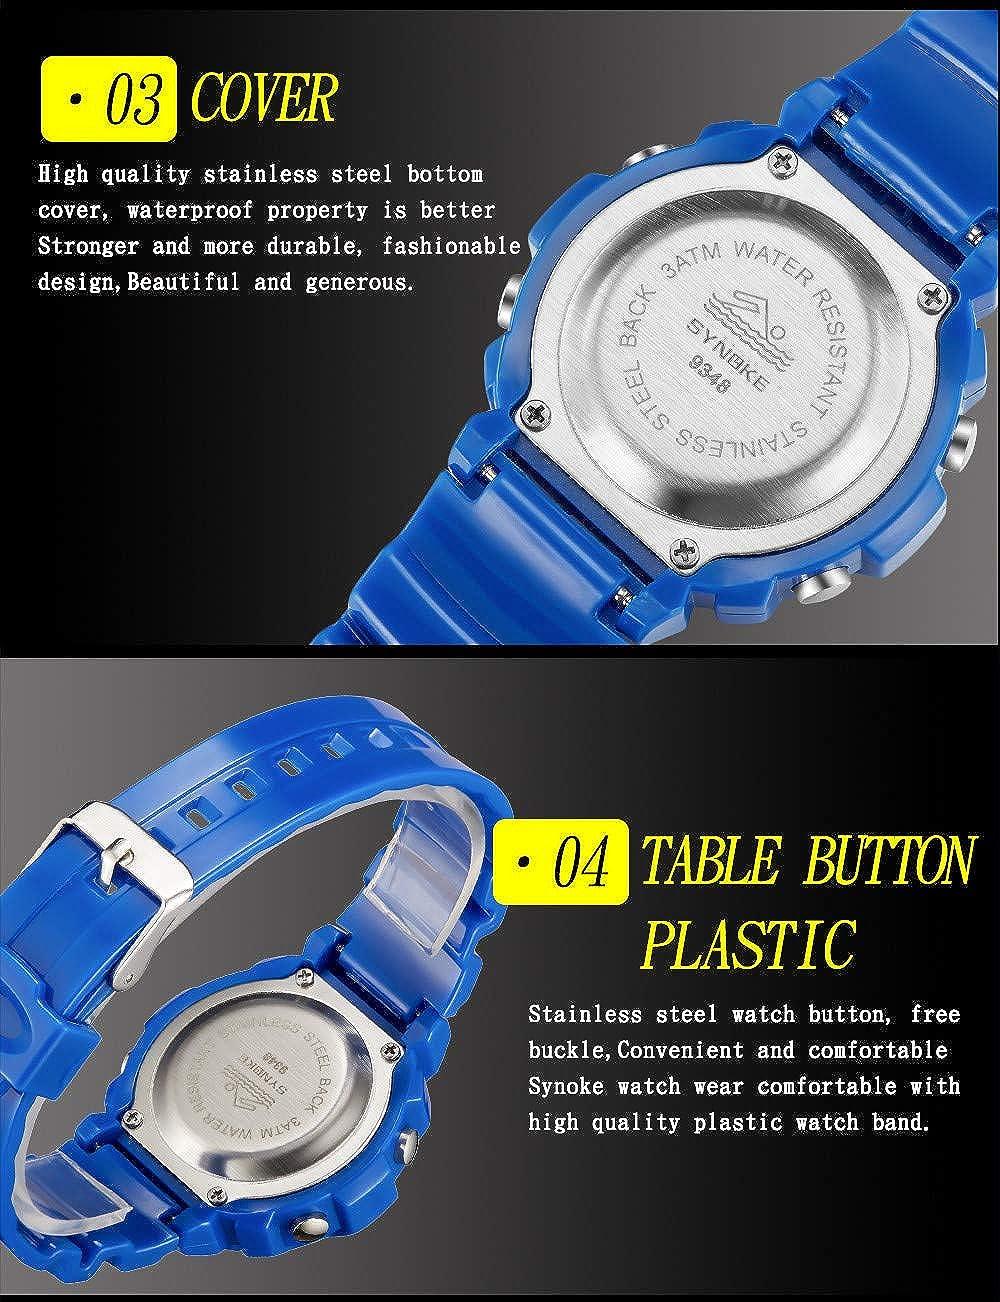 Rcool Relojes suizos relojes de lujo Relojes de pulsera Relojes para mujer Relojes para hombre Relojes deportivos,Reloj deportivo impermeable LED: ...